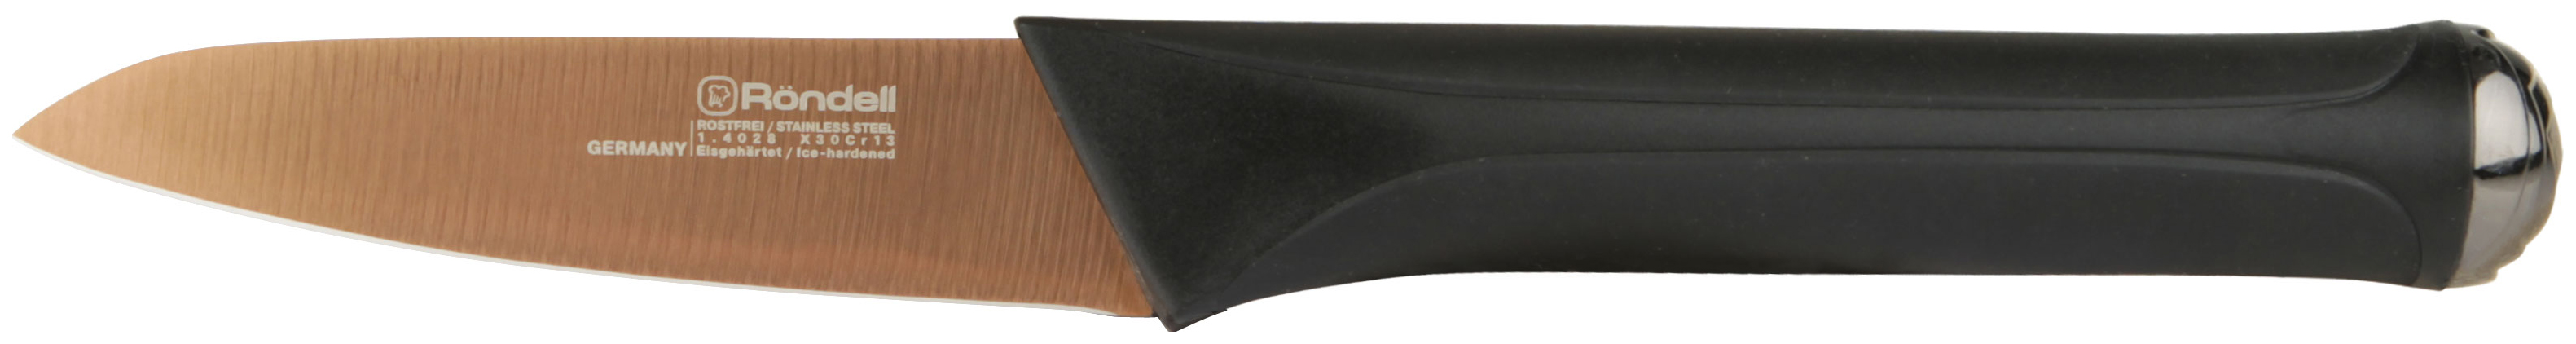 Нож кухонный Röndell RD-694 9 см от Rondell